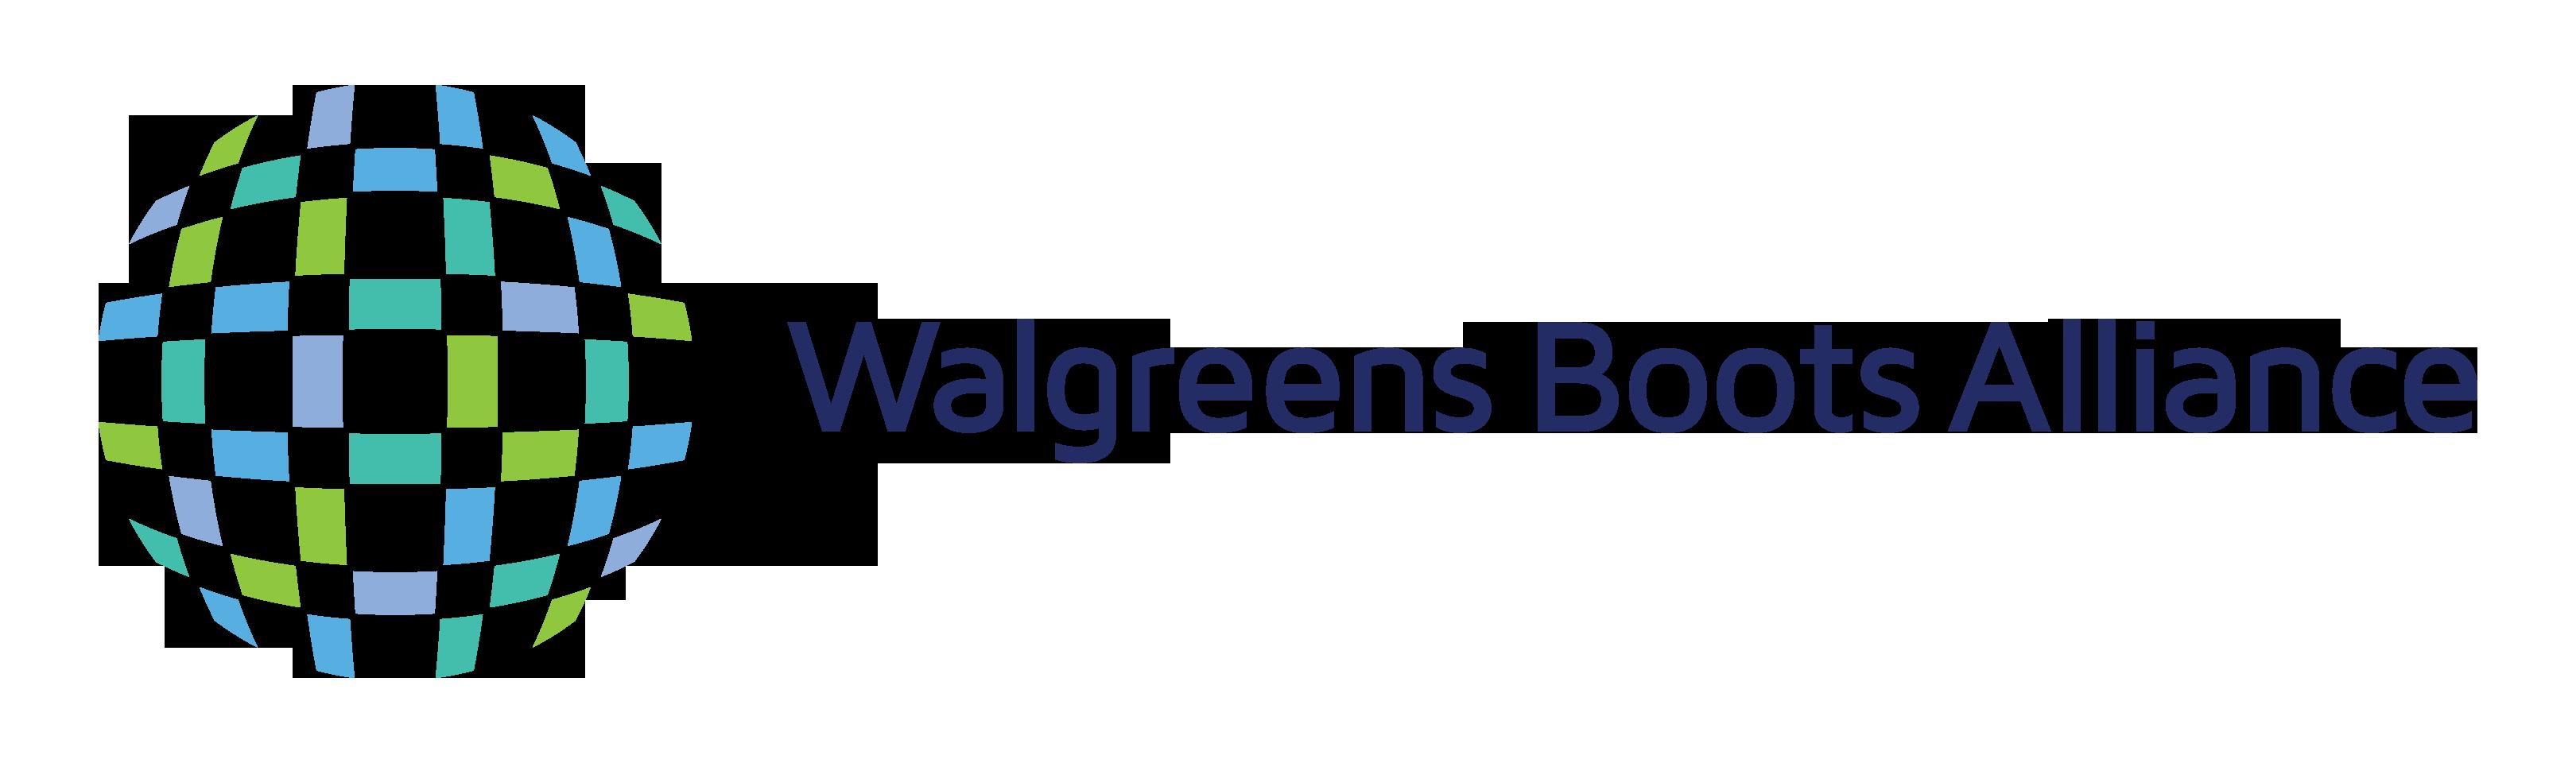 Walgreens Boots Alliance Logo Png Image Alliance Logo Logos Alliance